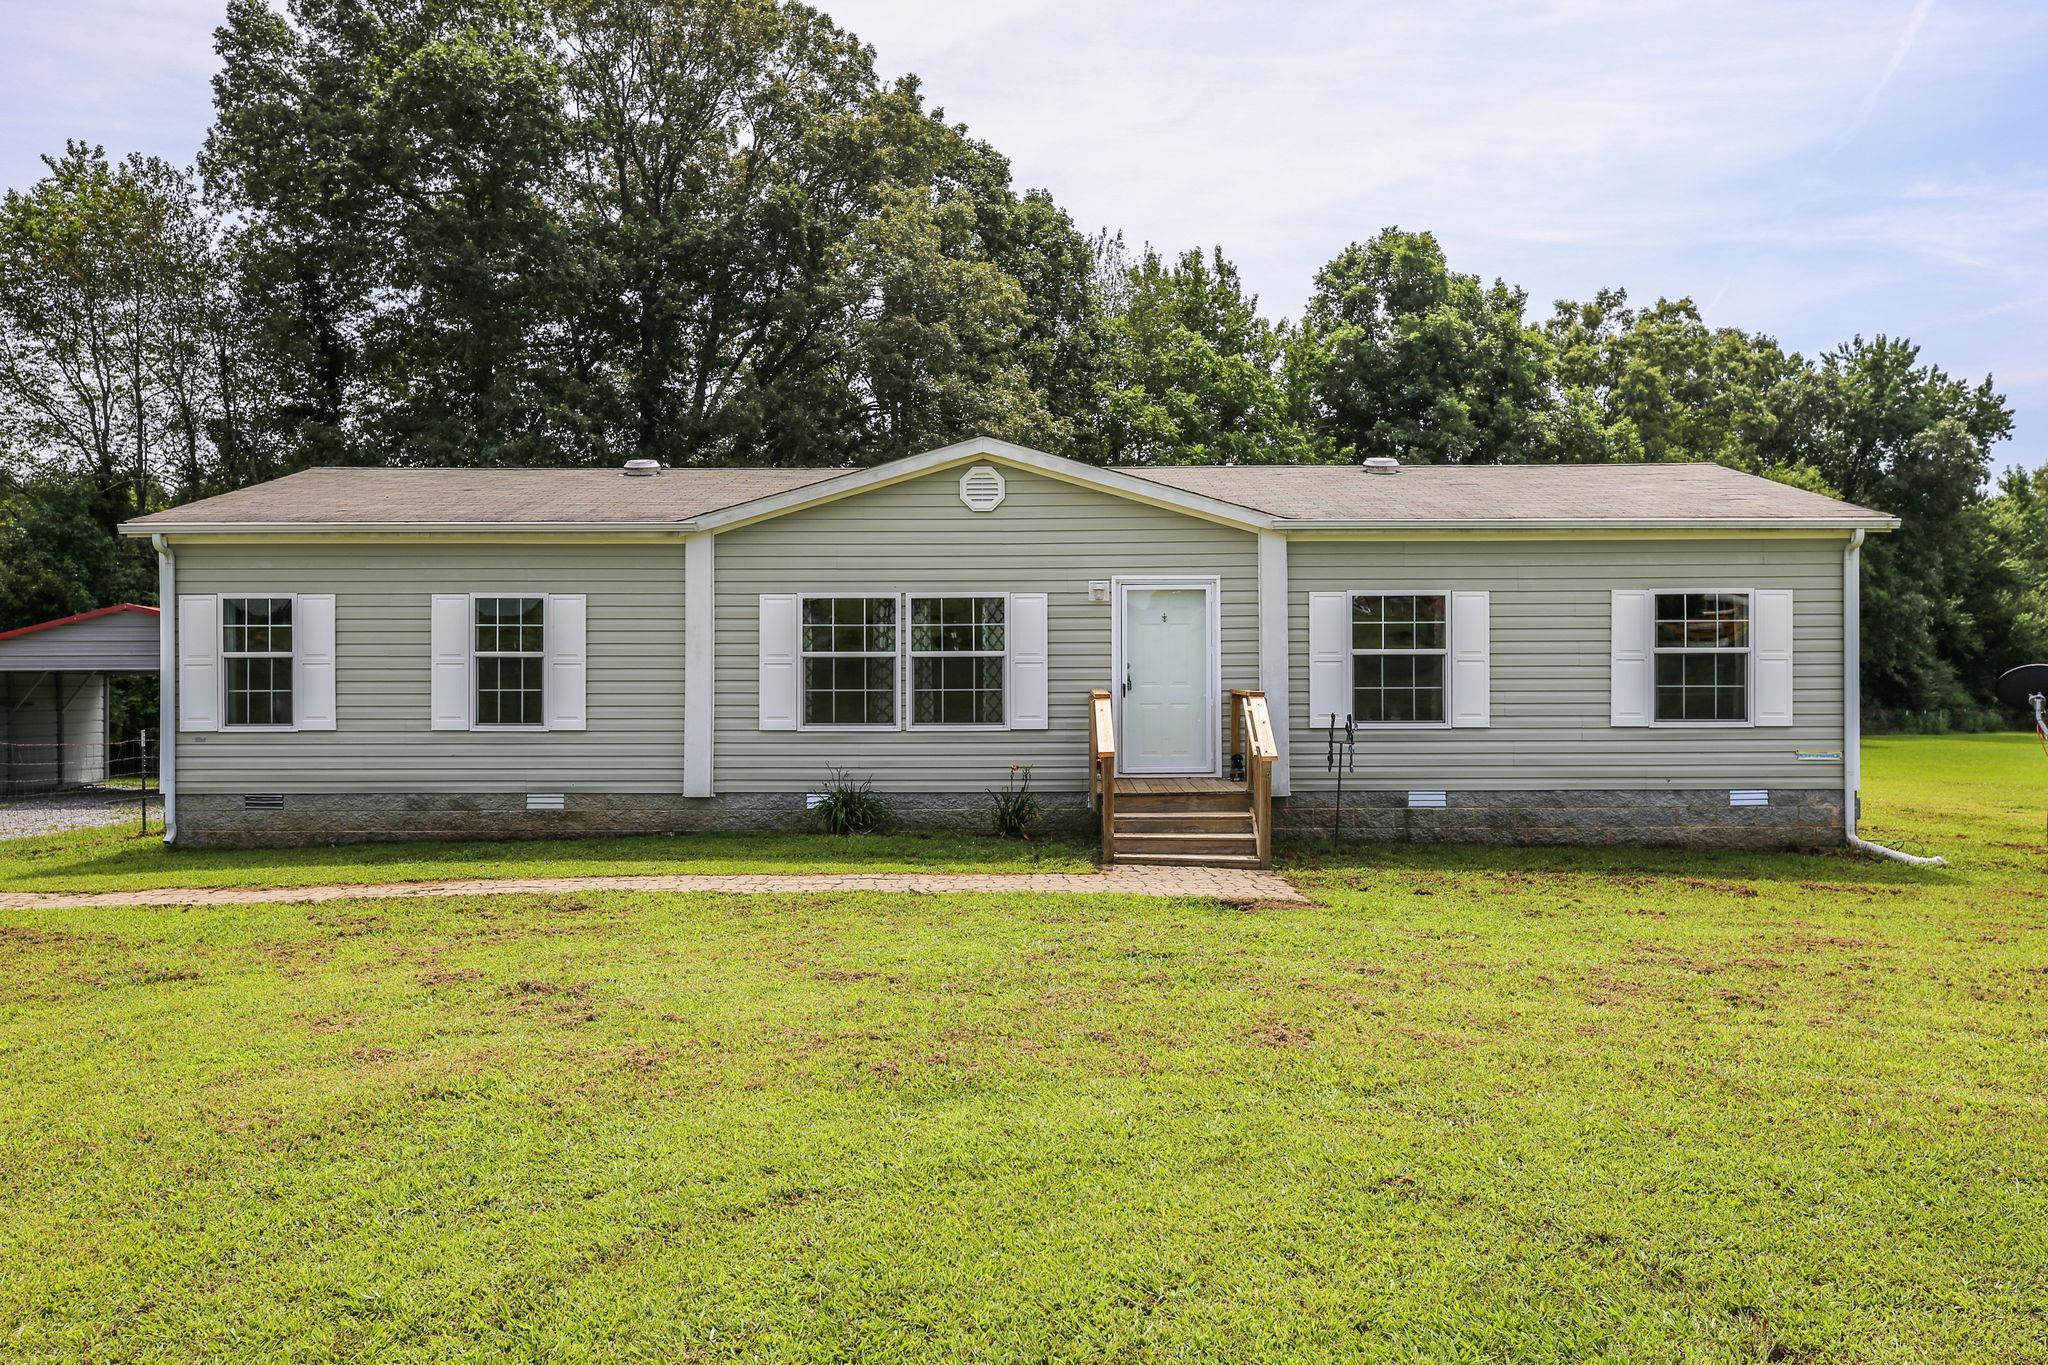 513 Ferrells Loop Rd, Beechgrove, TN 37018 - Beechgrove, TN real estate listing